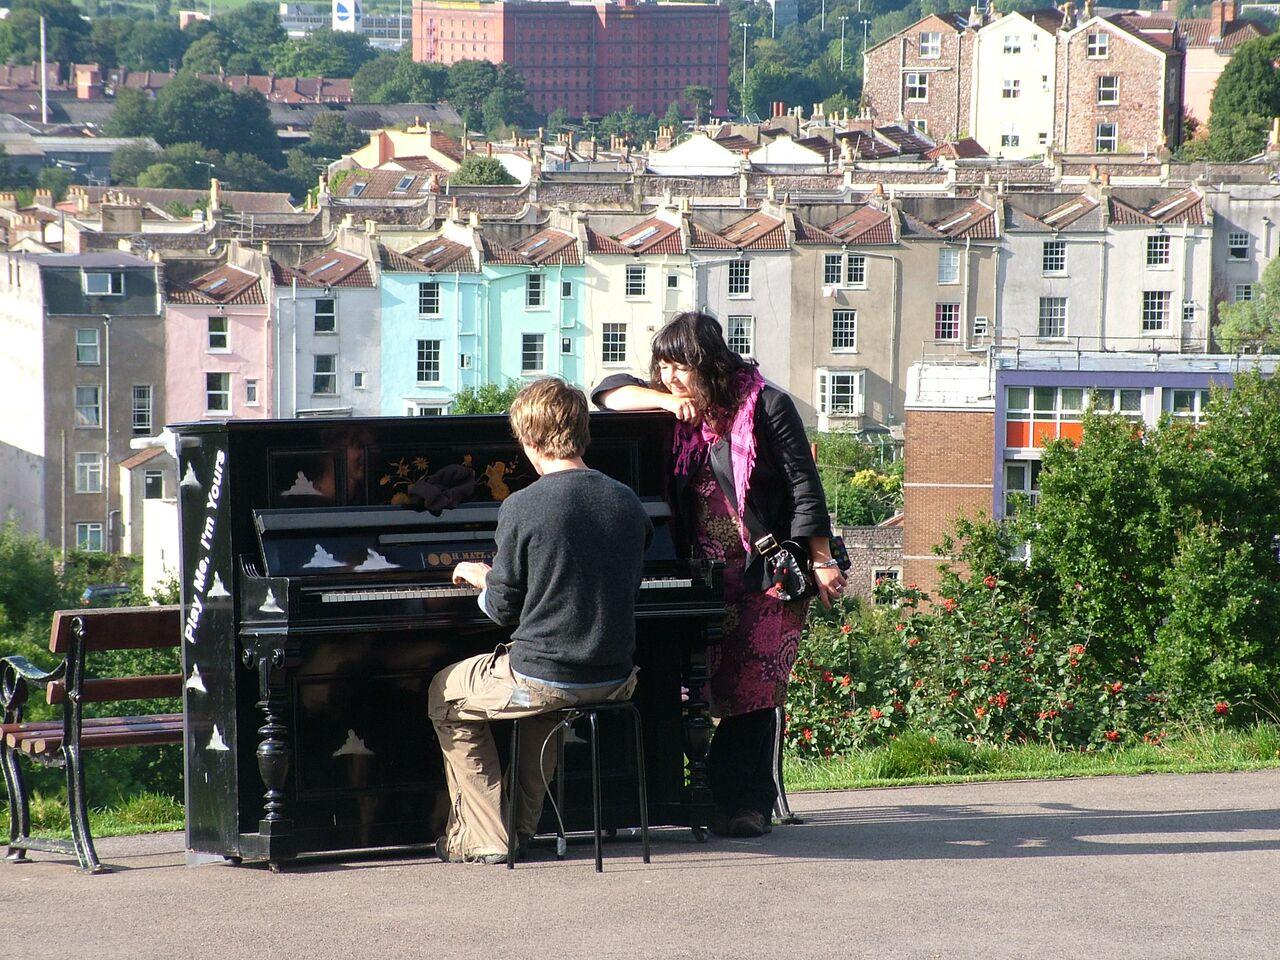 Hilltop_Piano_Bristol 2009